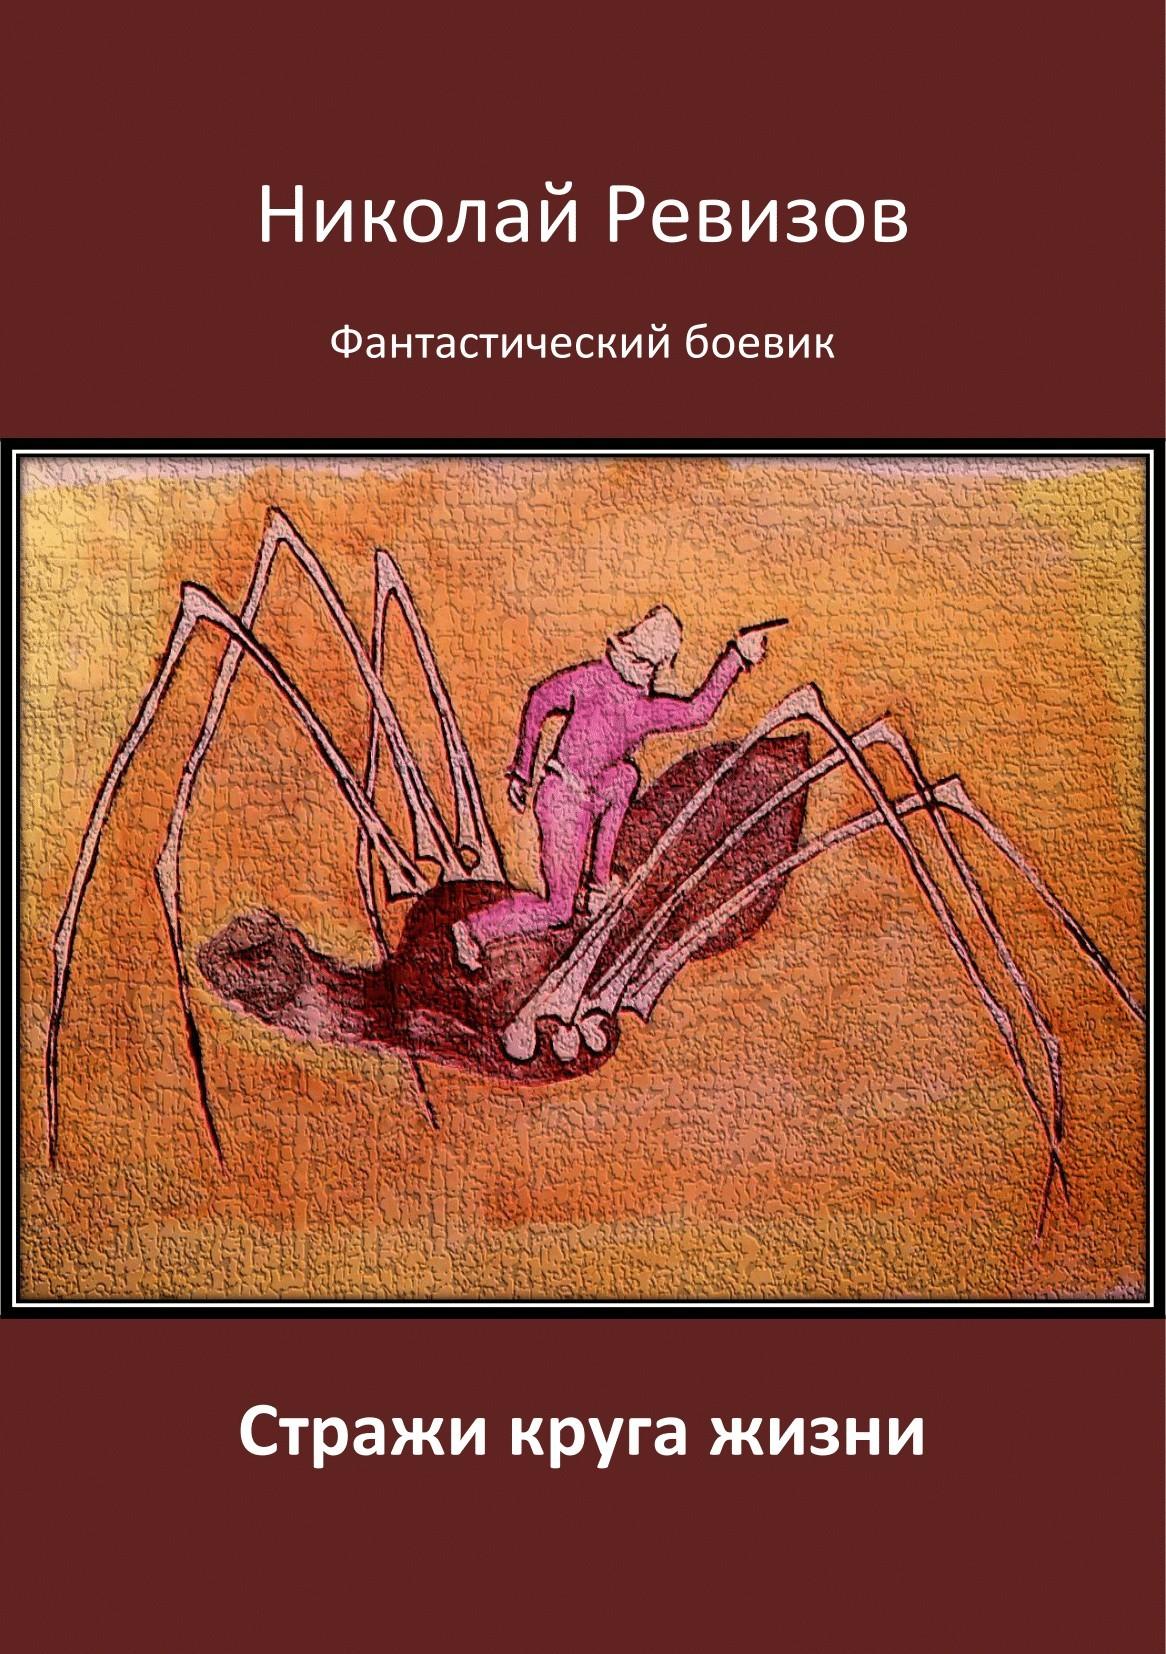 Николай Ревизов - Стражи круга жизни